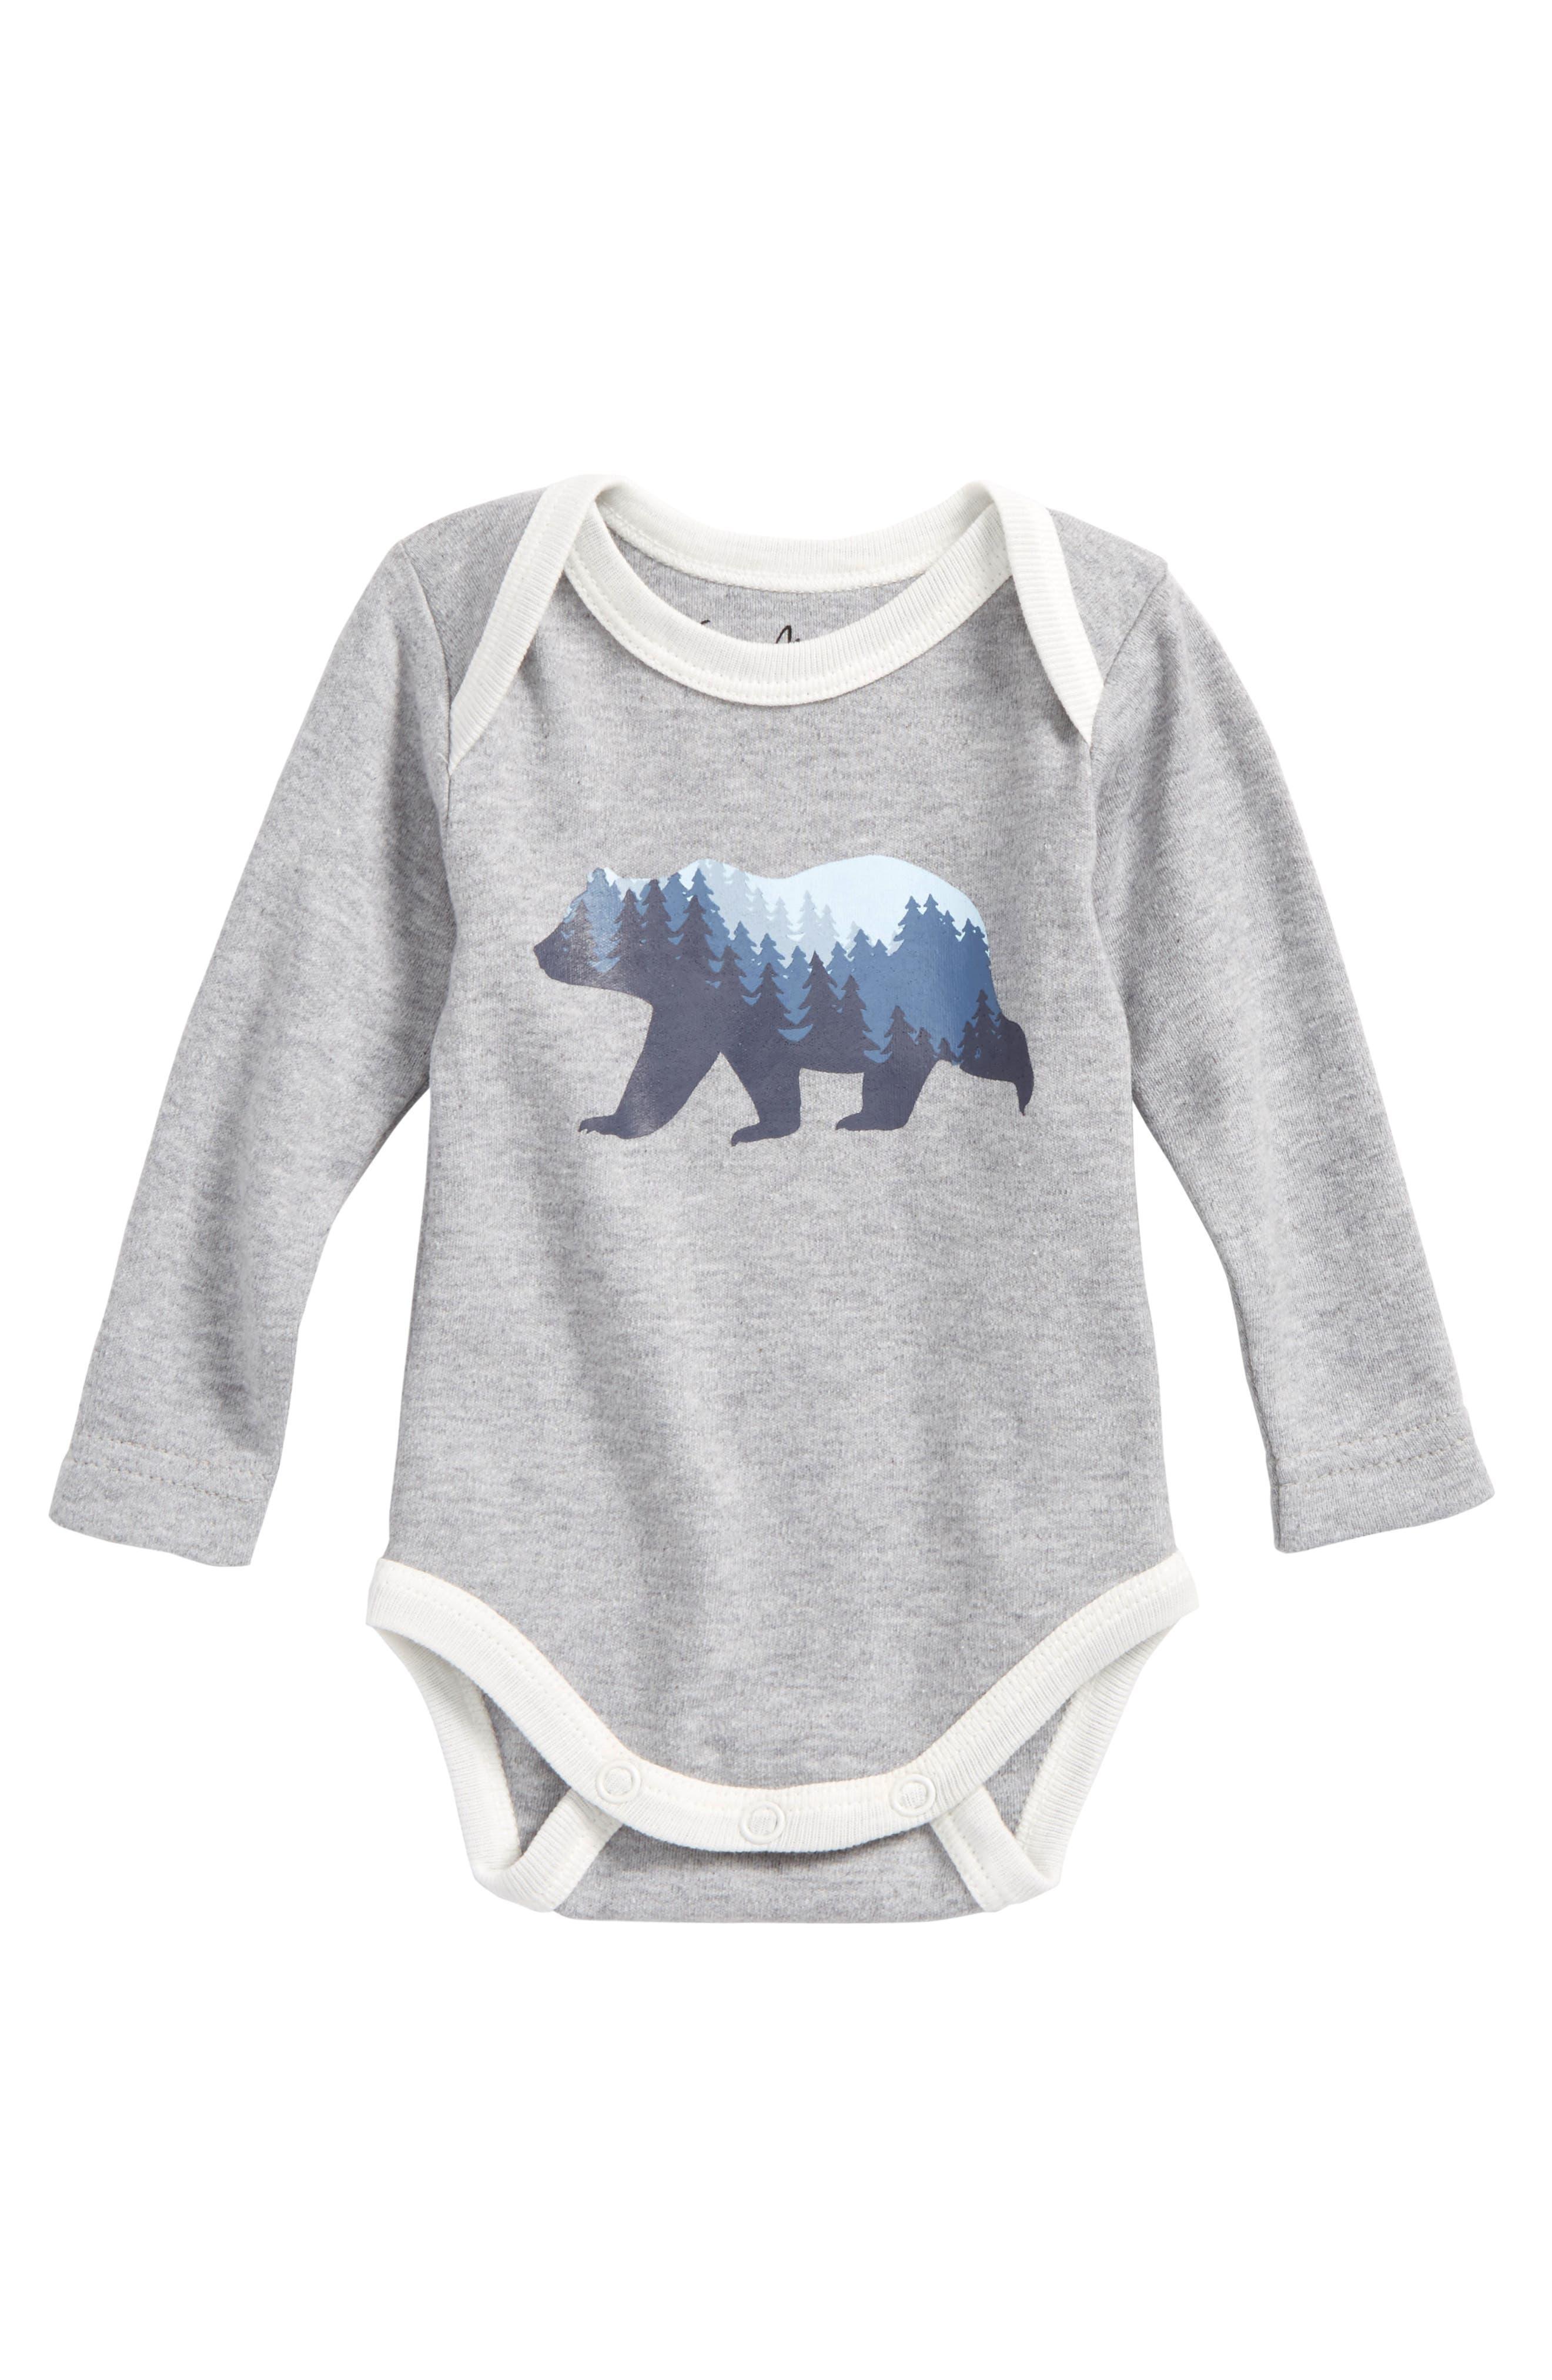 Bear Graphic Organic Cotton Bodysuit,                         Main,                         color, 020